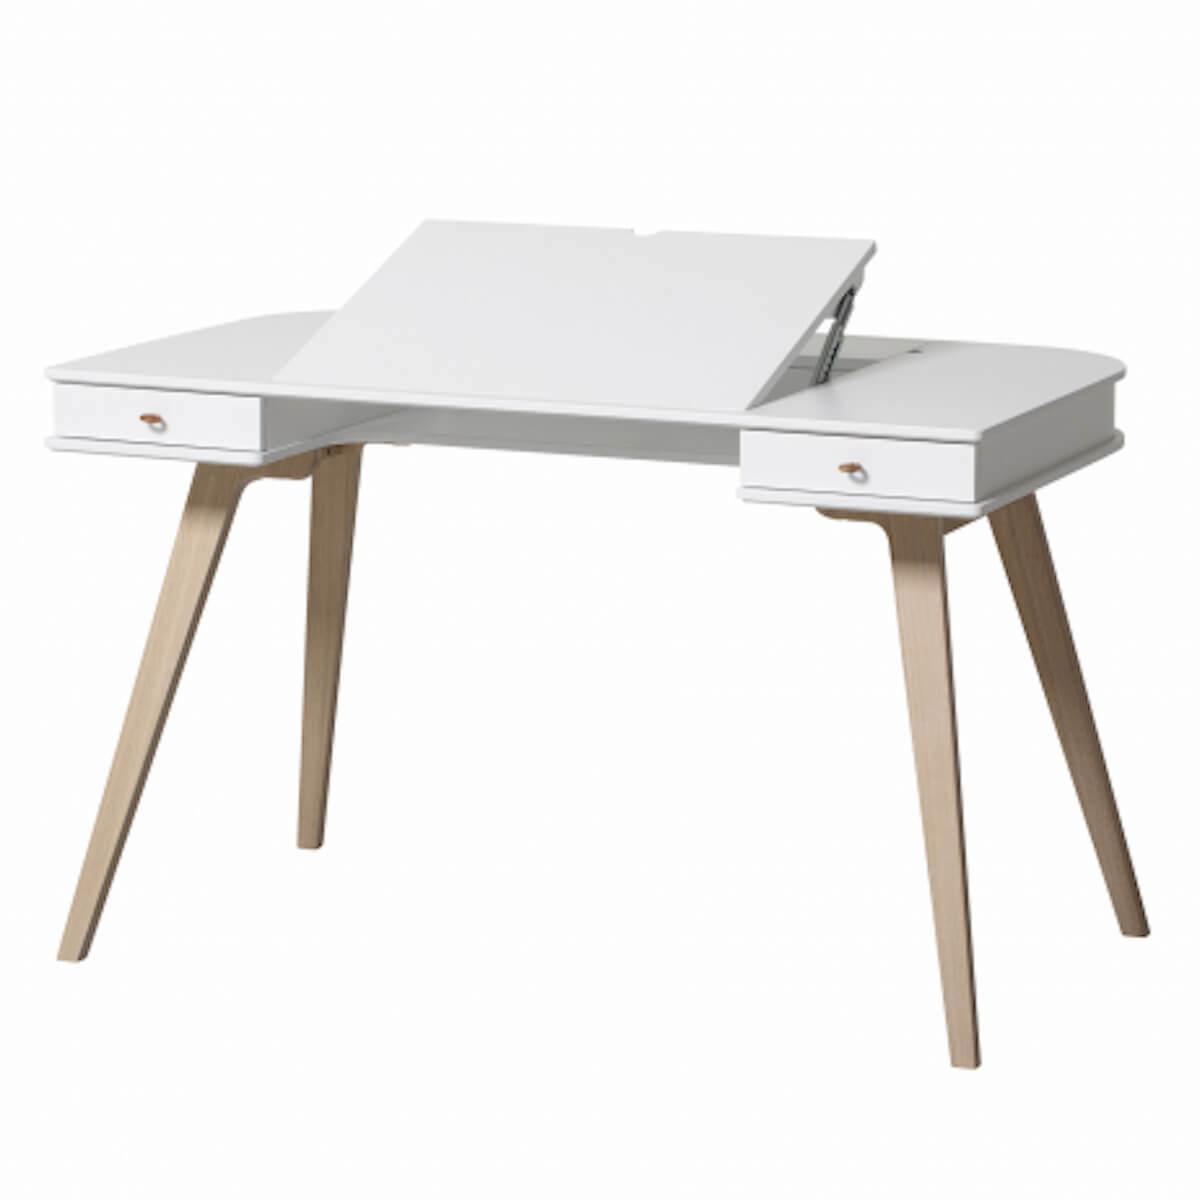 Bureau-chaise 72,6 cm WOOD Oliver Furniture blanc-chêne